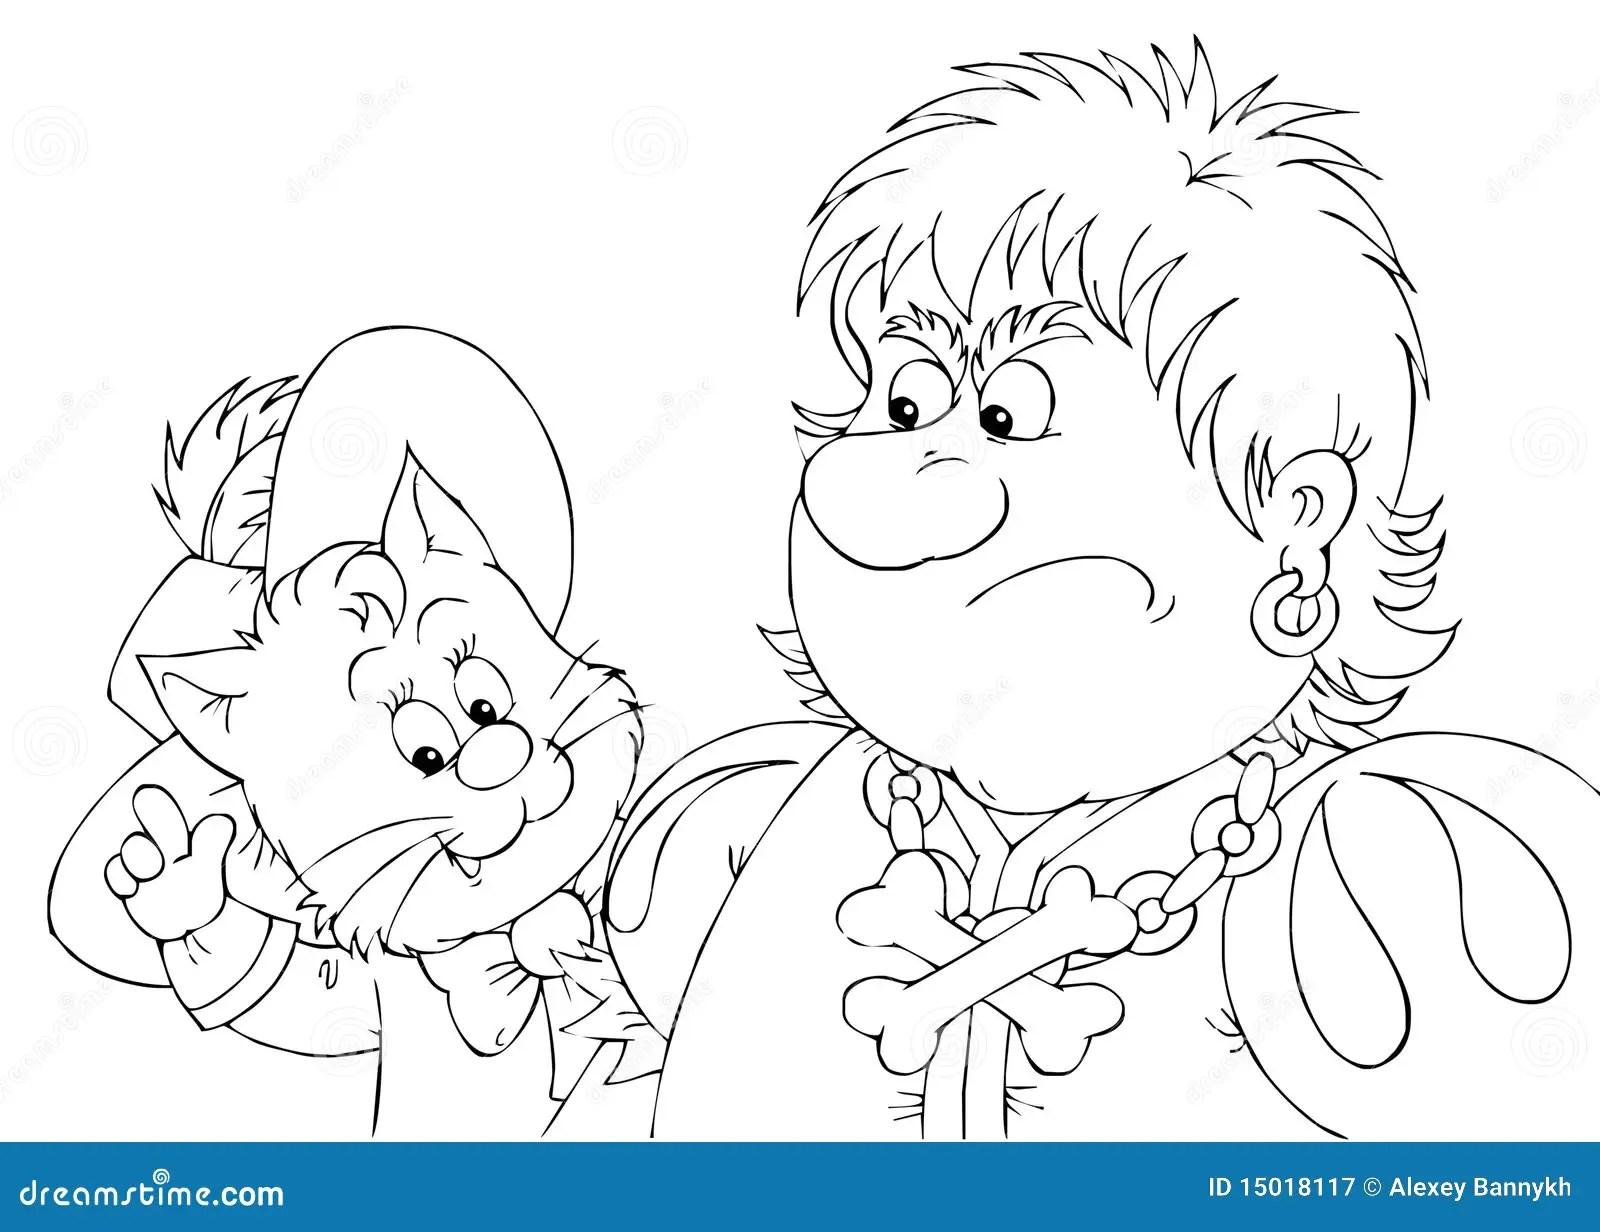 Ogre Cartoon Images